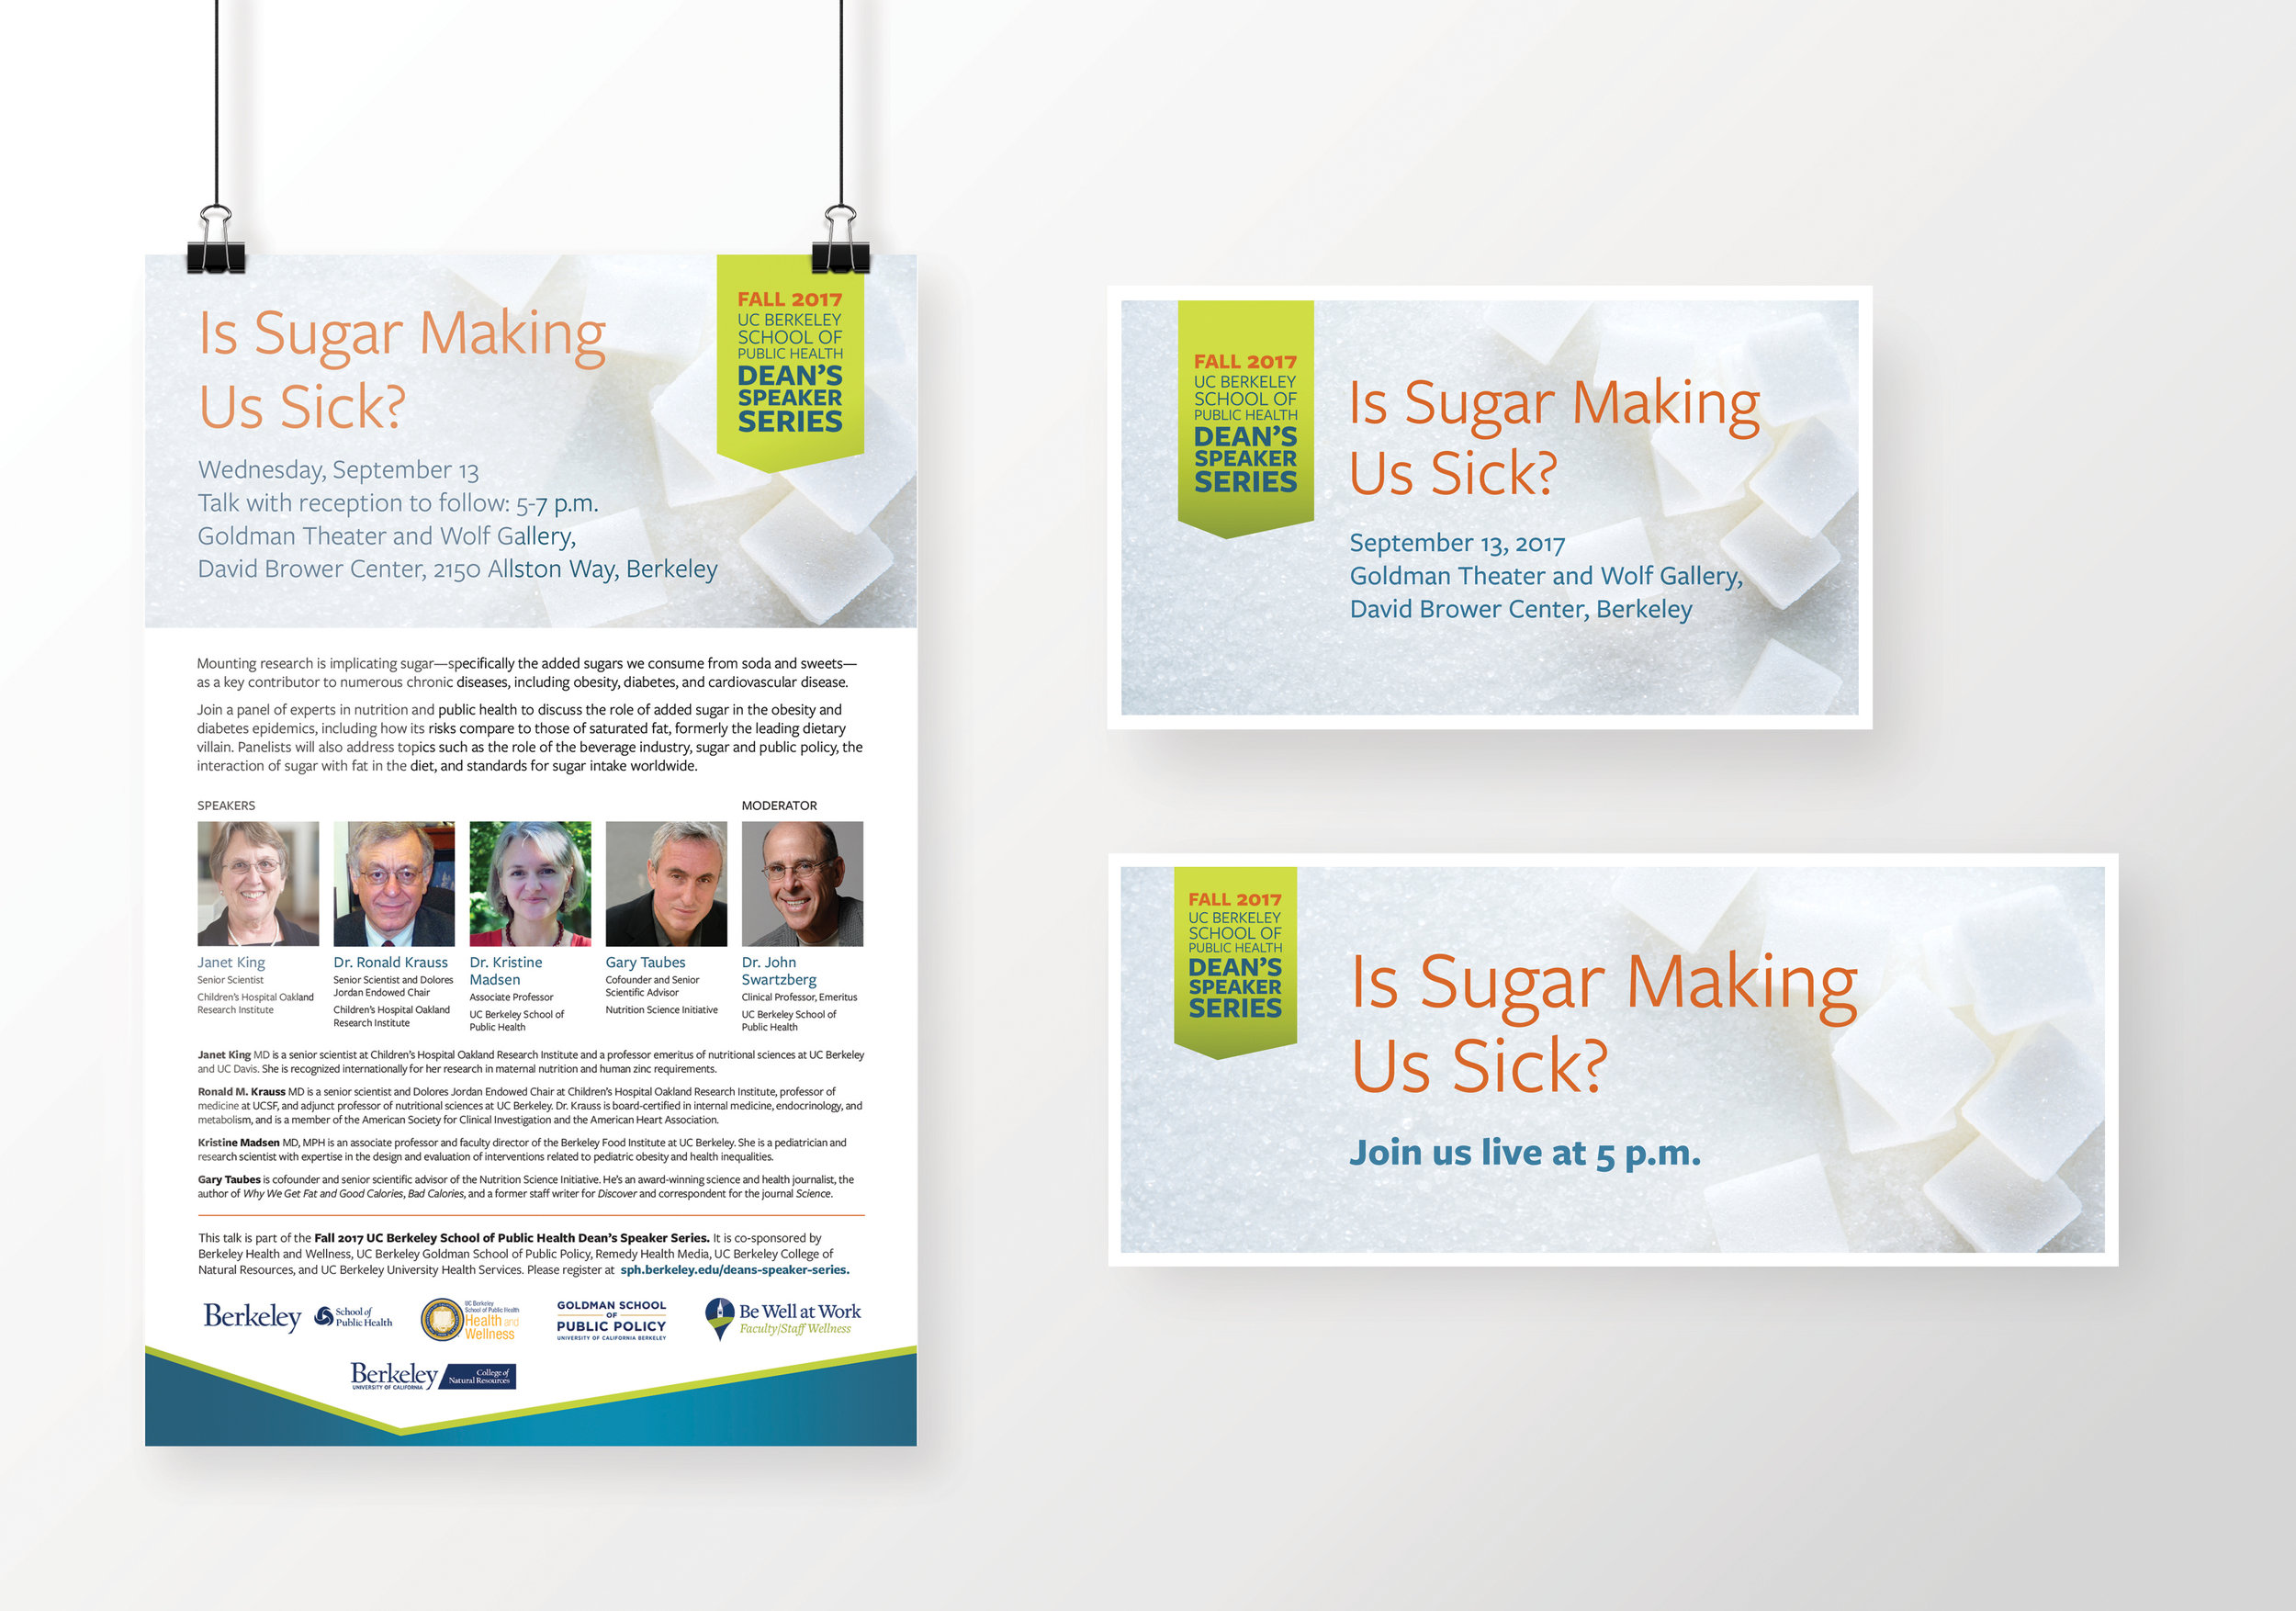 UC Berkeley School of Public Health Dean Speaker Series: Sugar Panel